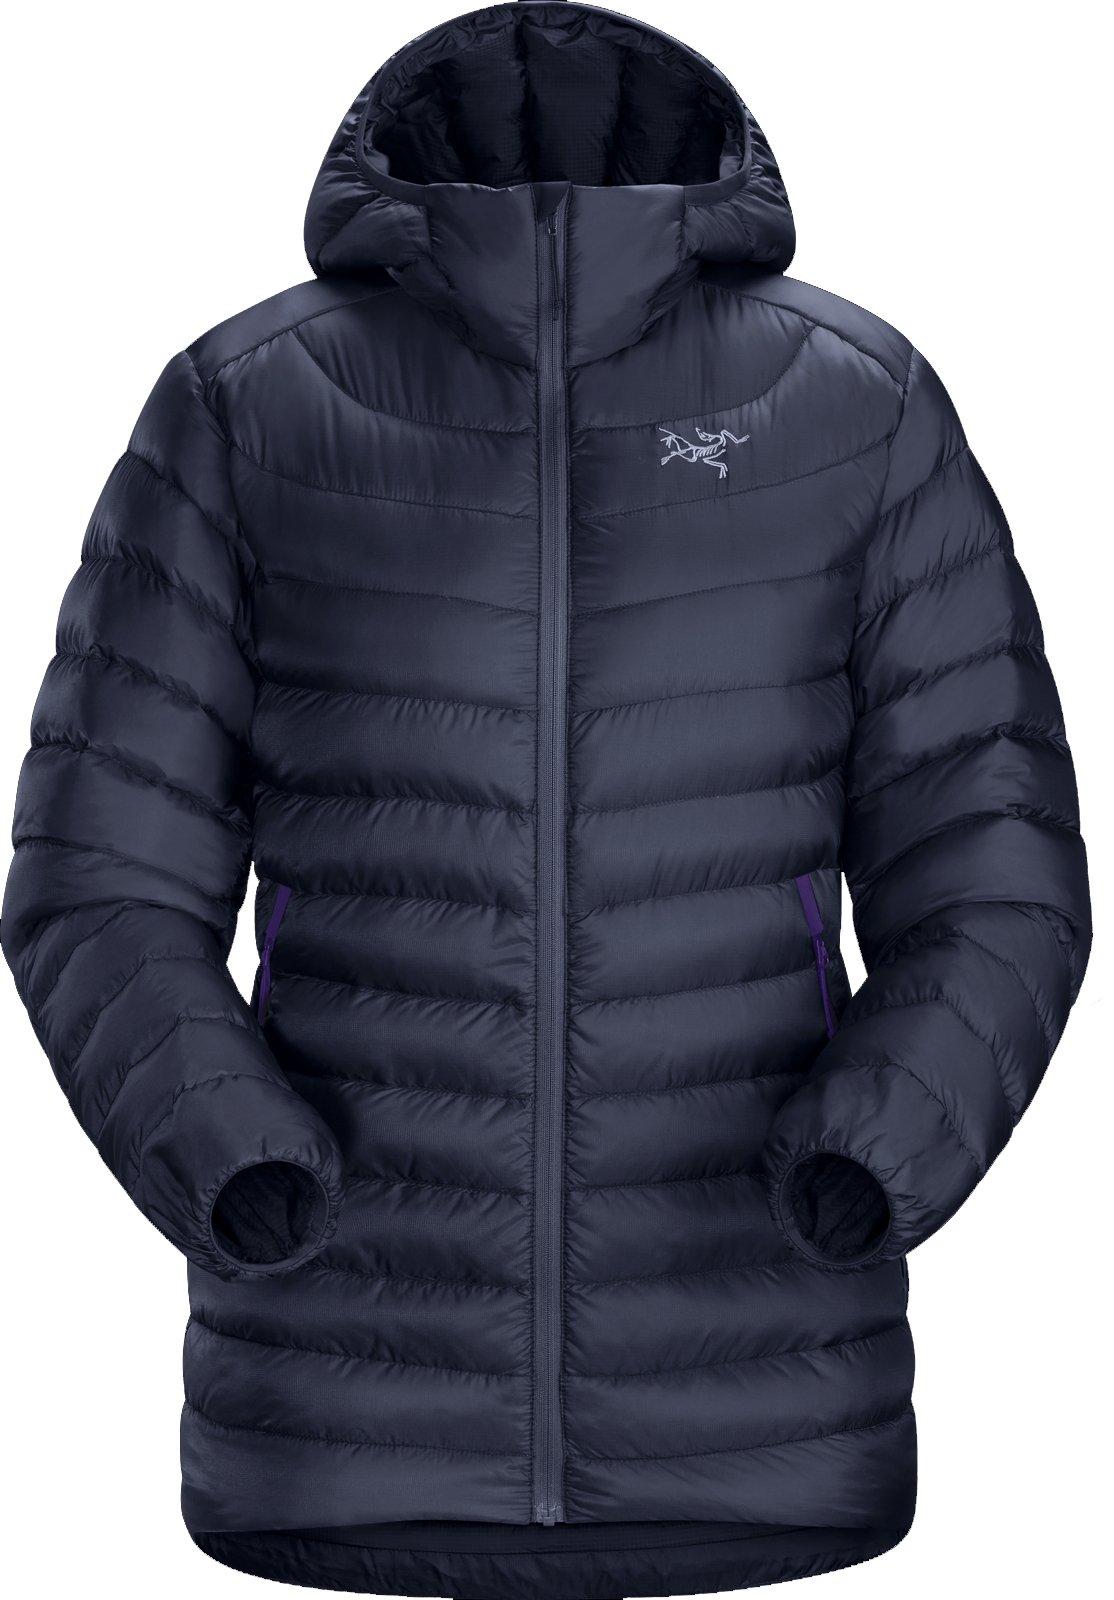 Arc'teryx Women's Cerium LT Hoodie Black Sapphire Sweatshirt